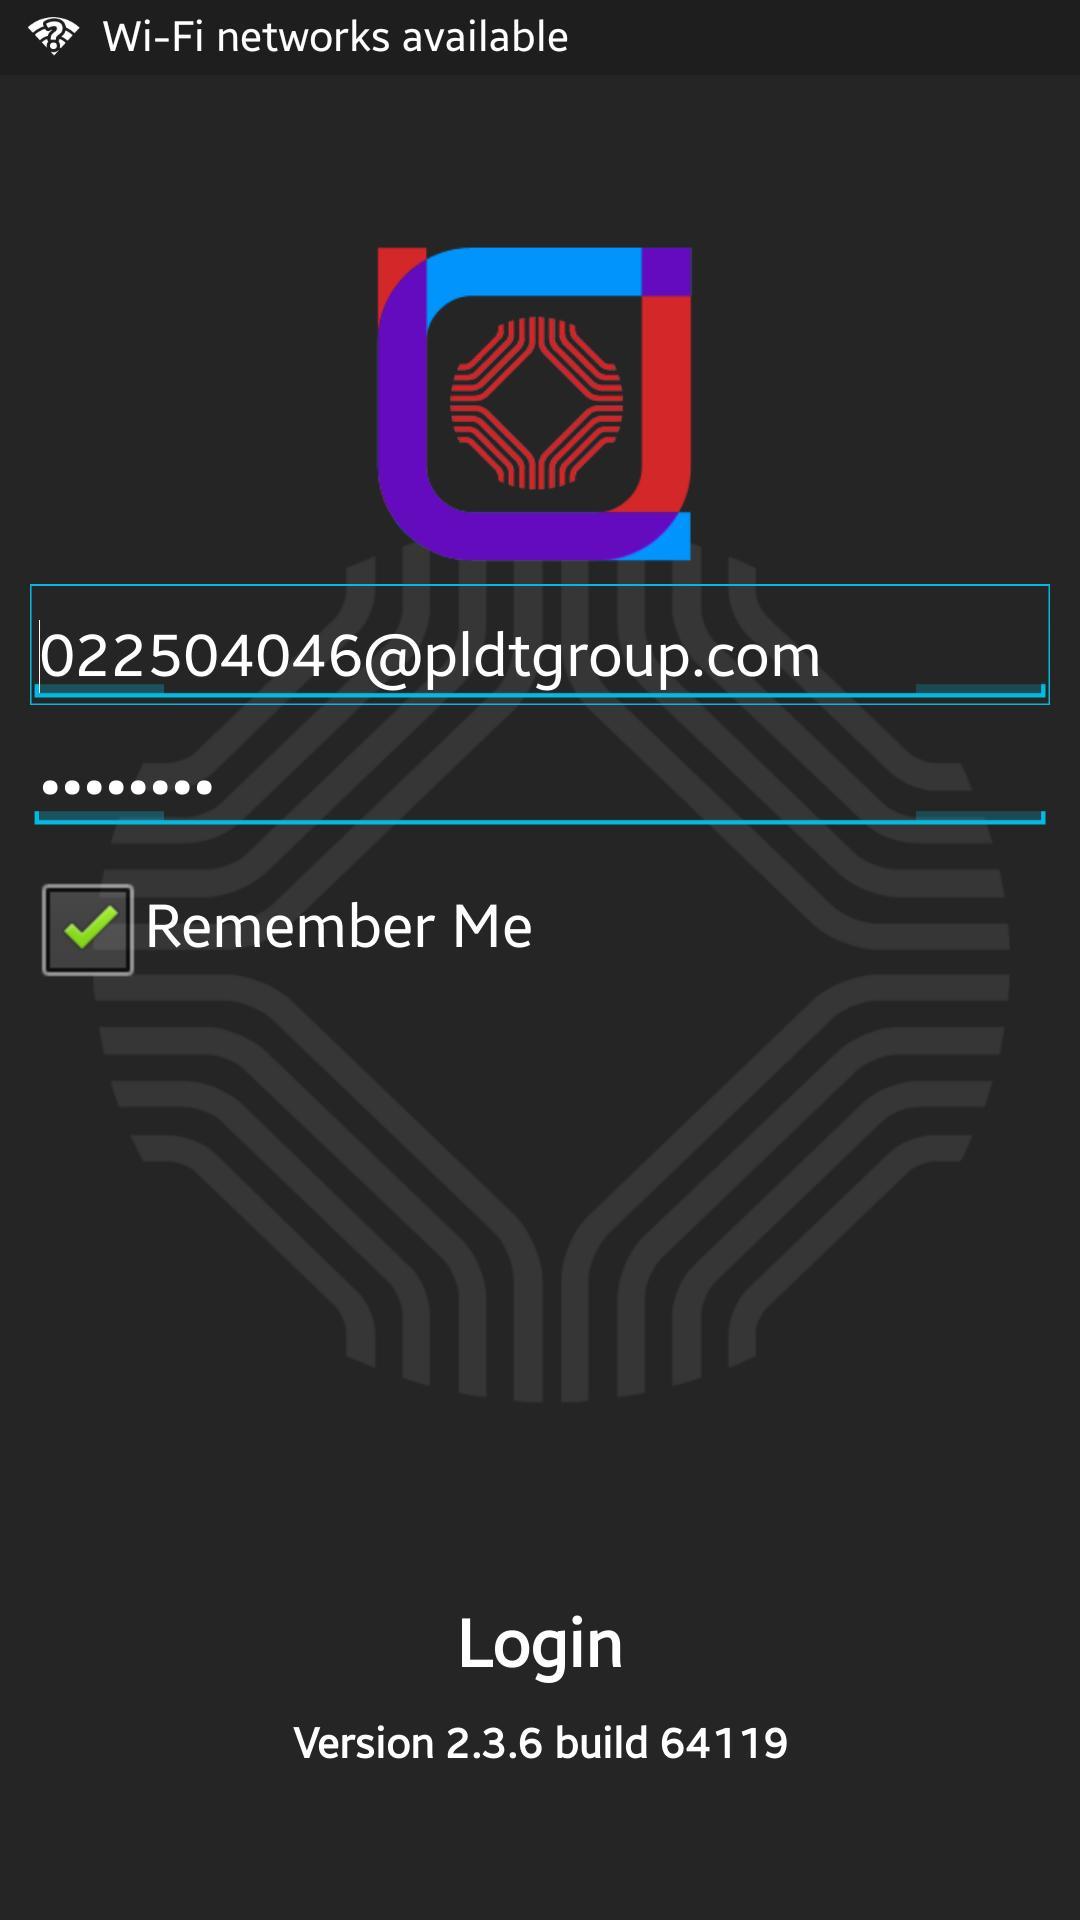 ⚡ Pldt wifi hack apk 2015 download | Download Apk Wifi